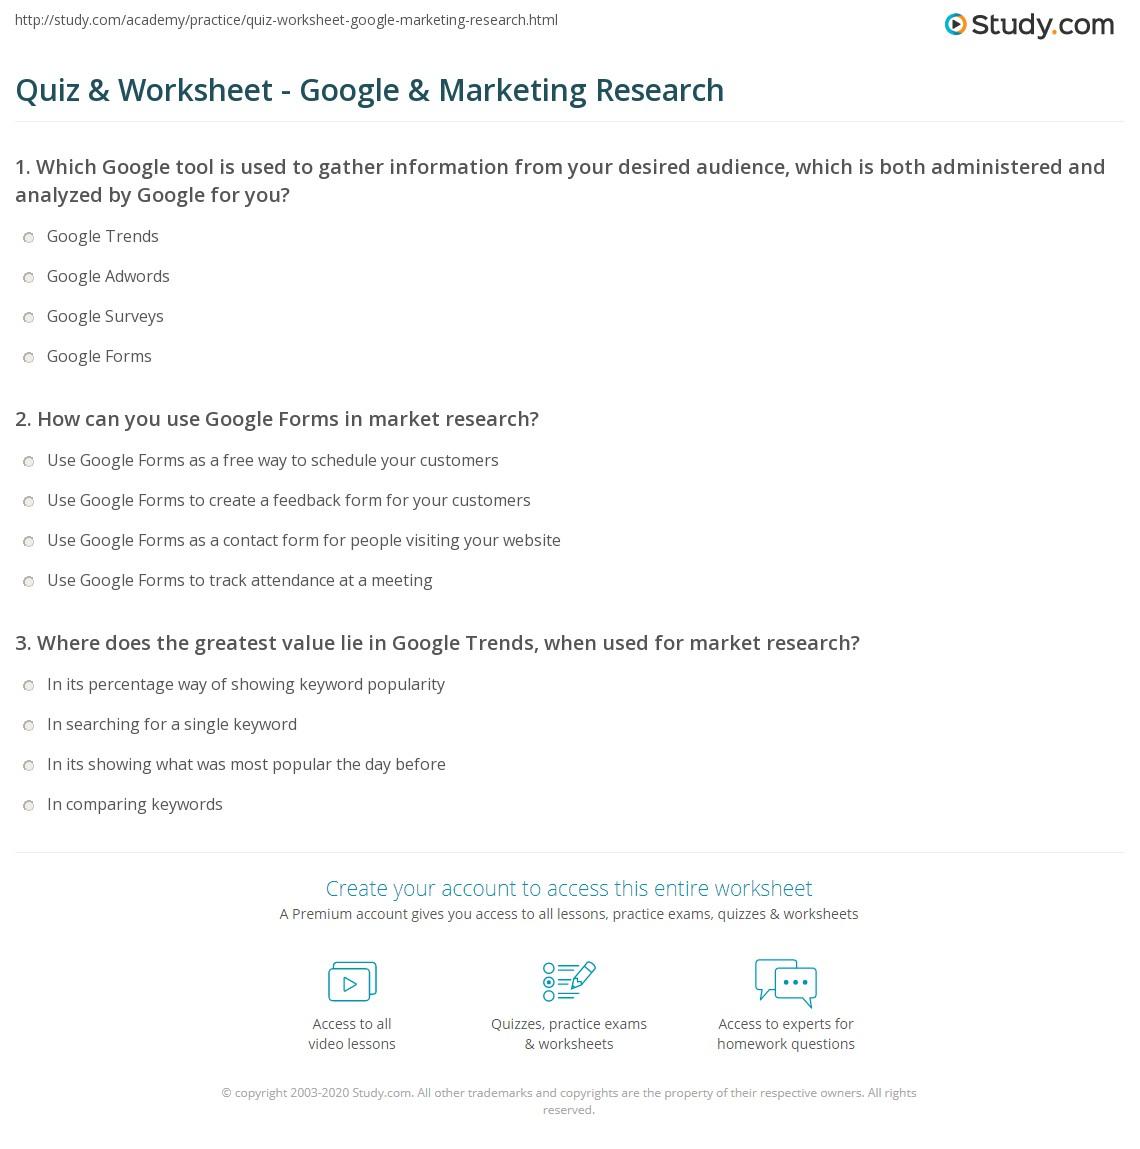 Quiz & Worksheet - Google & Marketing Research | Study com